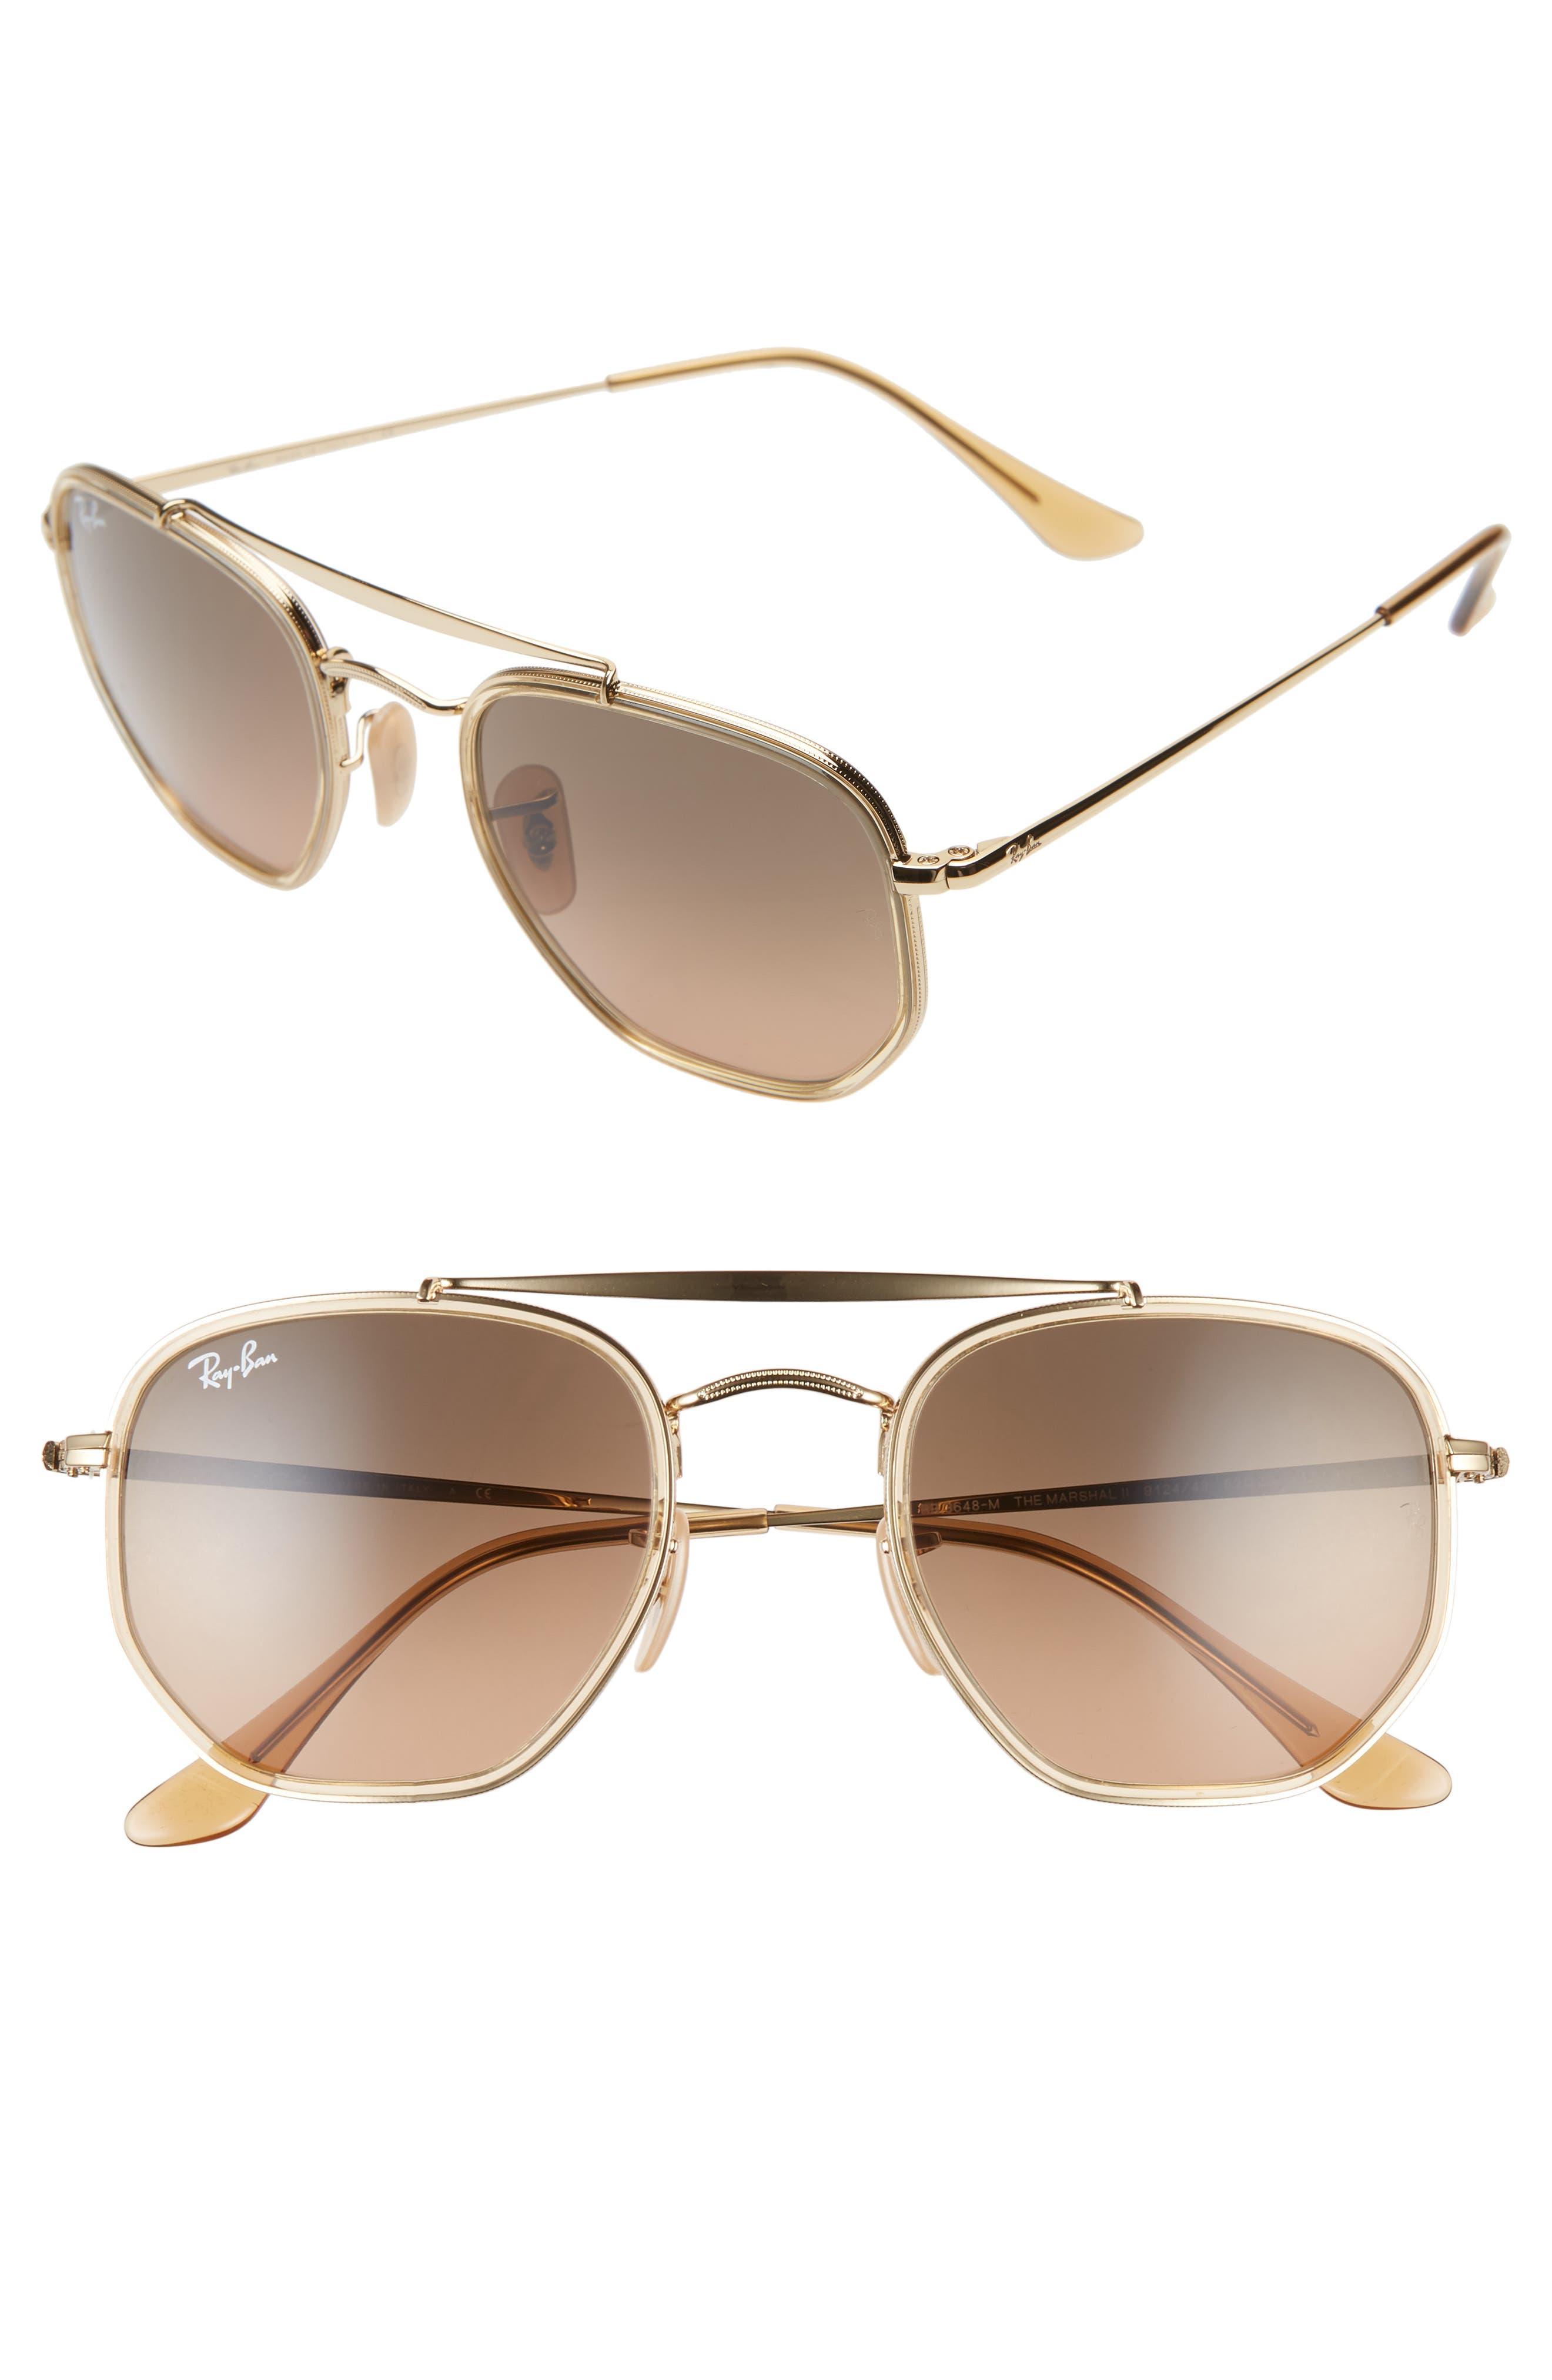 Ray-Ban 52Mm Aviator Sunglasses - Gold/ Brown Gradient